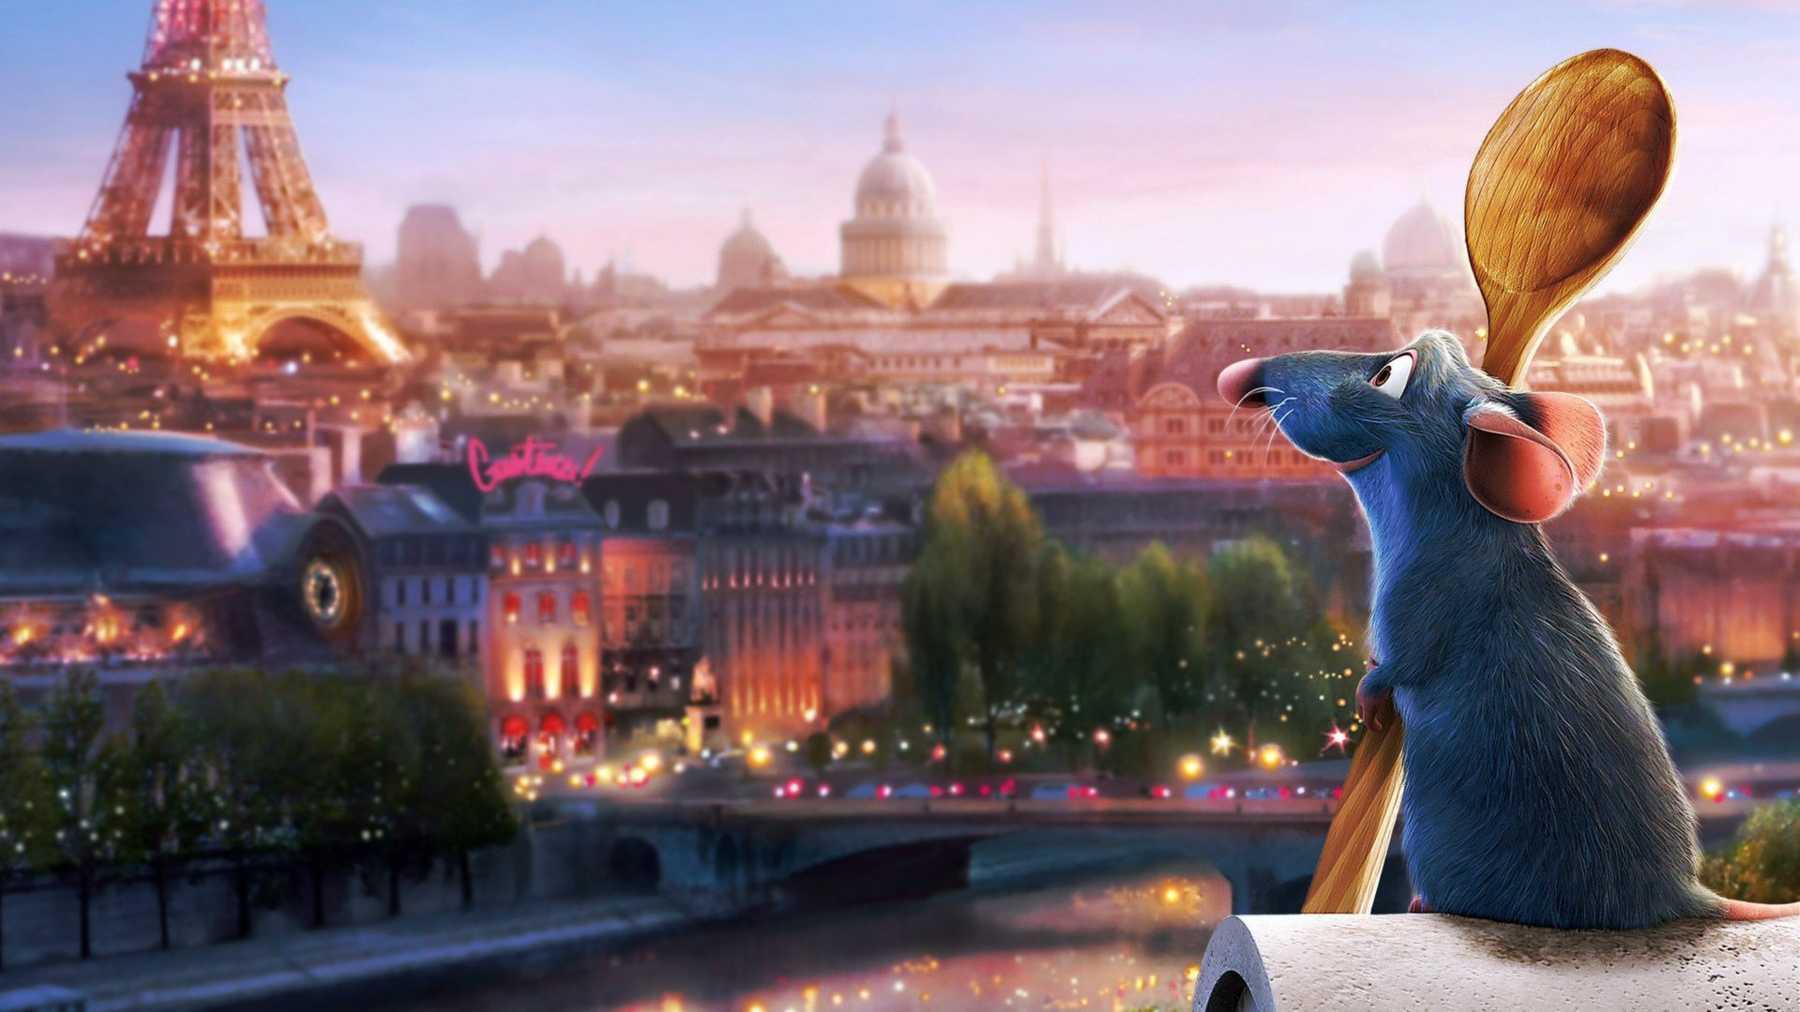 Tituss Burgess, Adam Lambert star in 'Ratatouille' musical